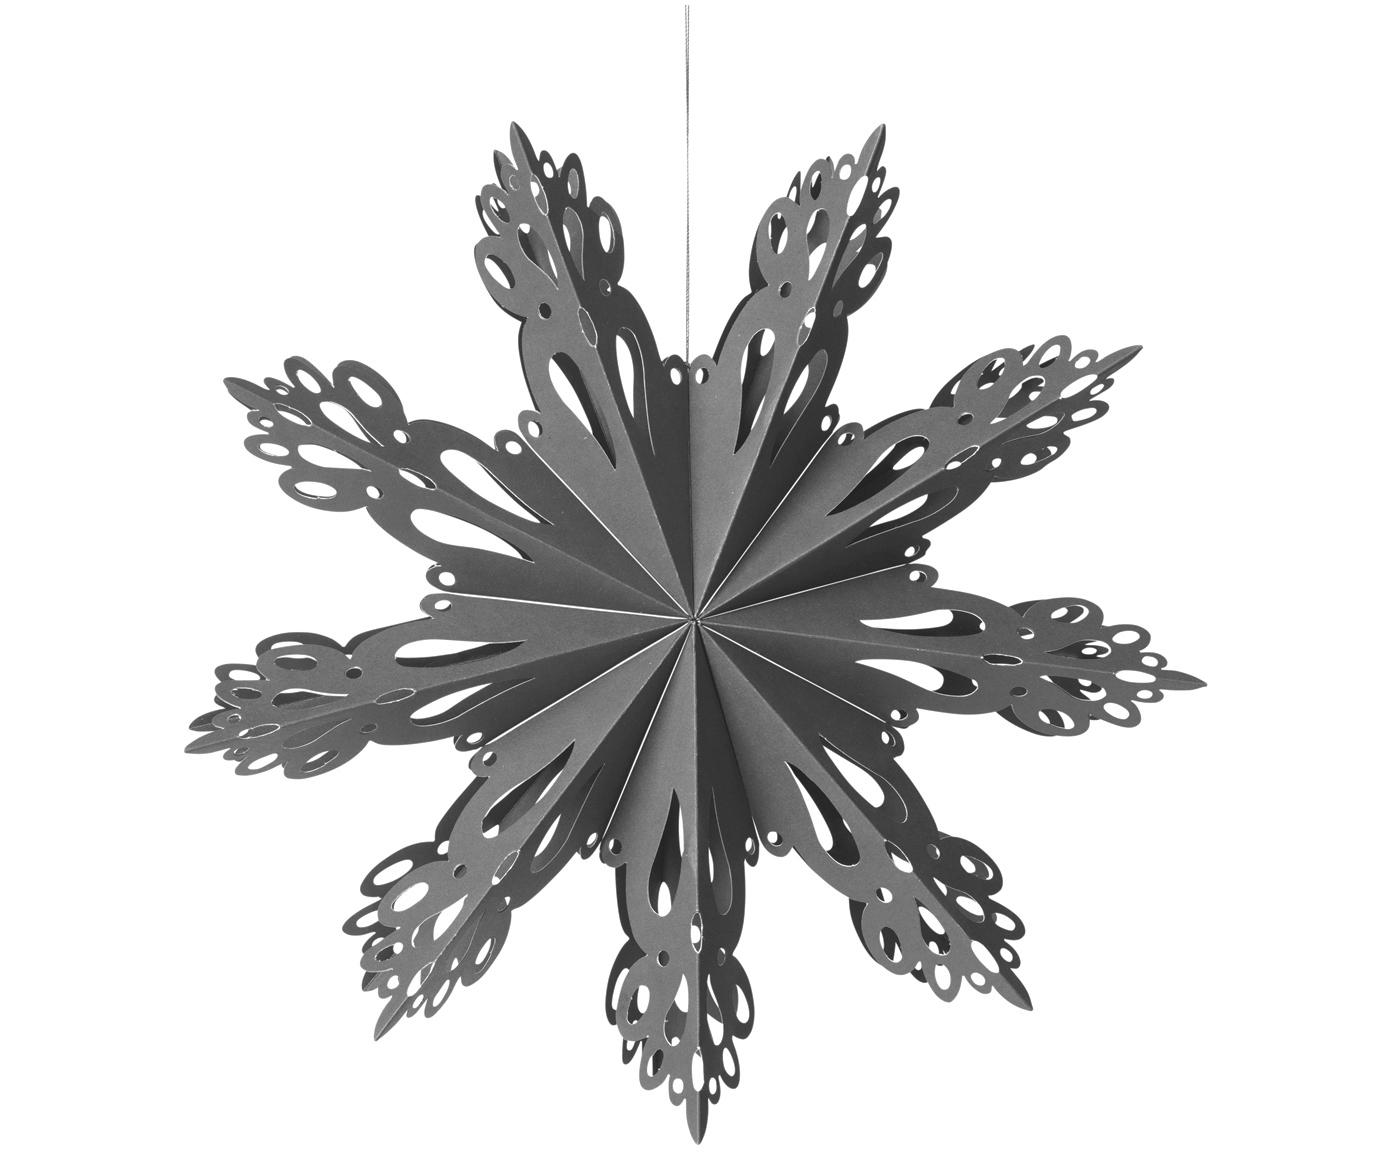 XL-kerstboomhanger Snowflake, Papier, Grijsblauw, Ø 30 cm